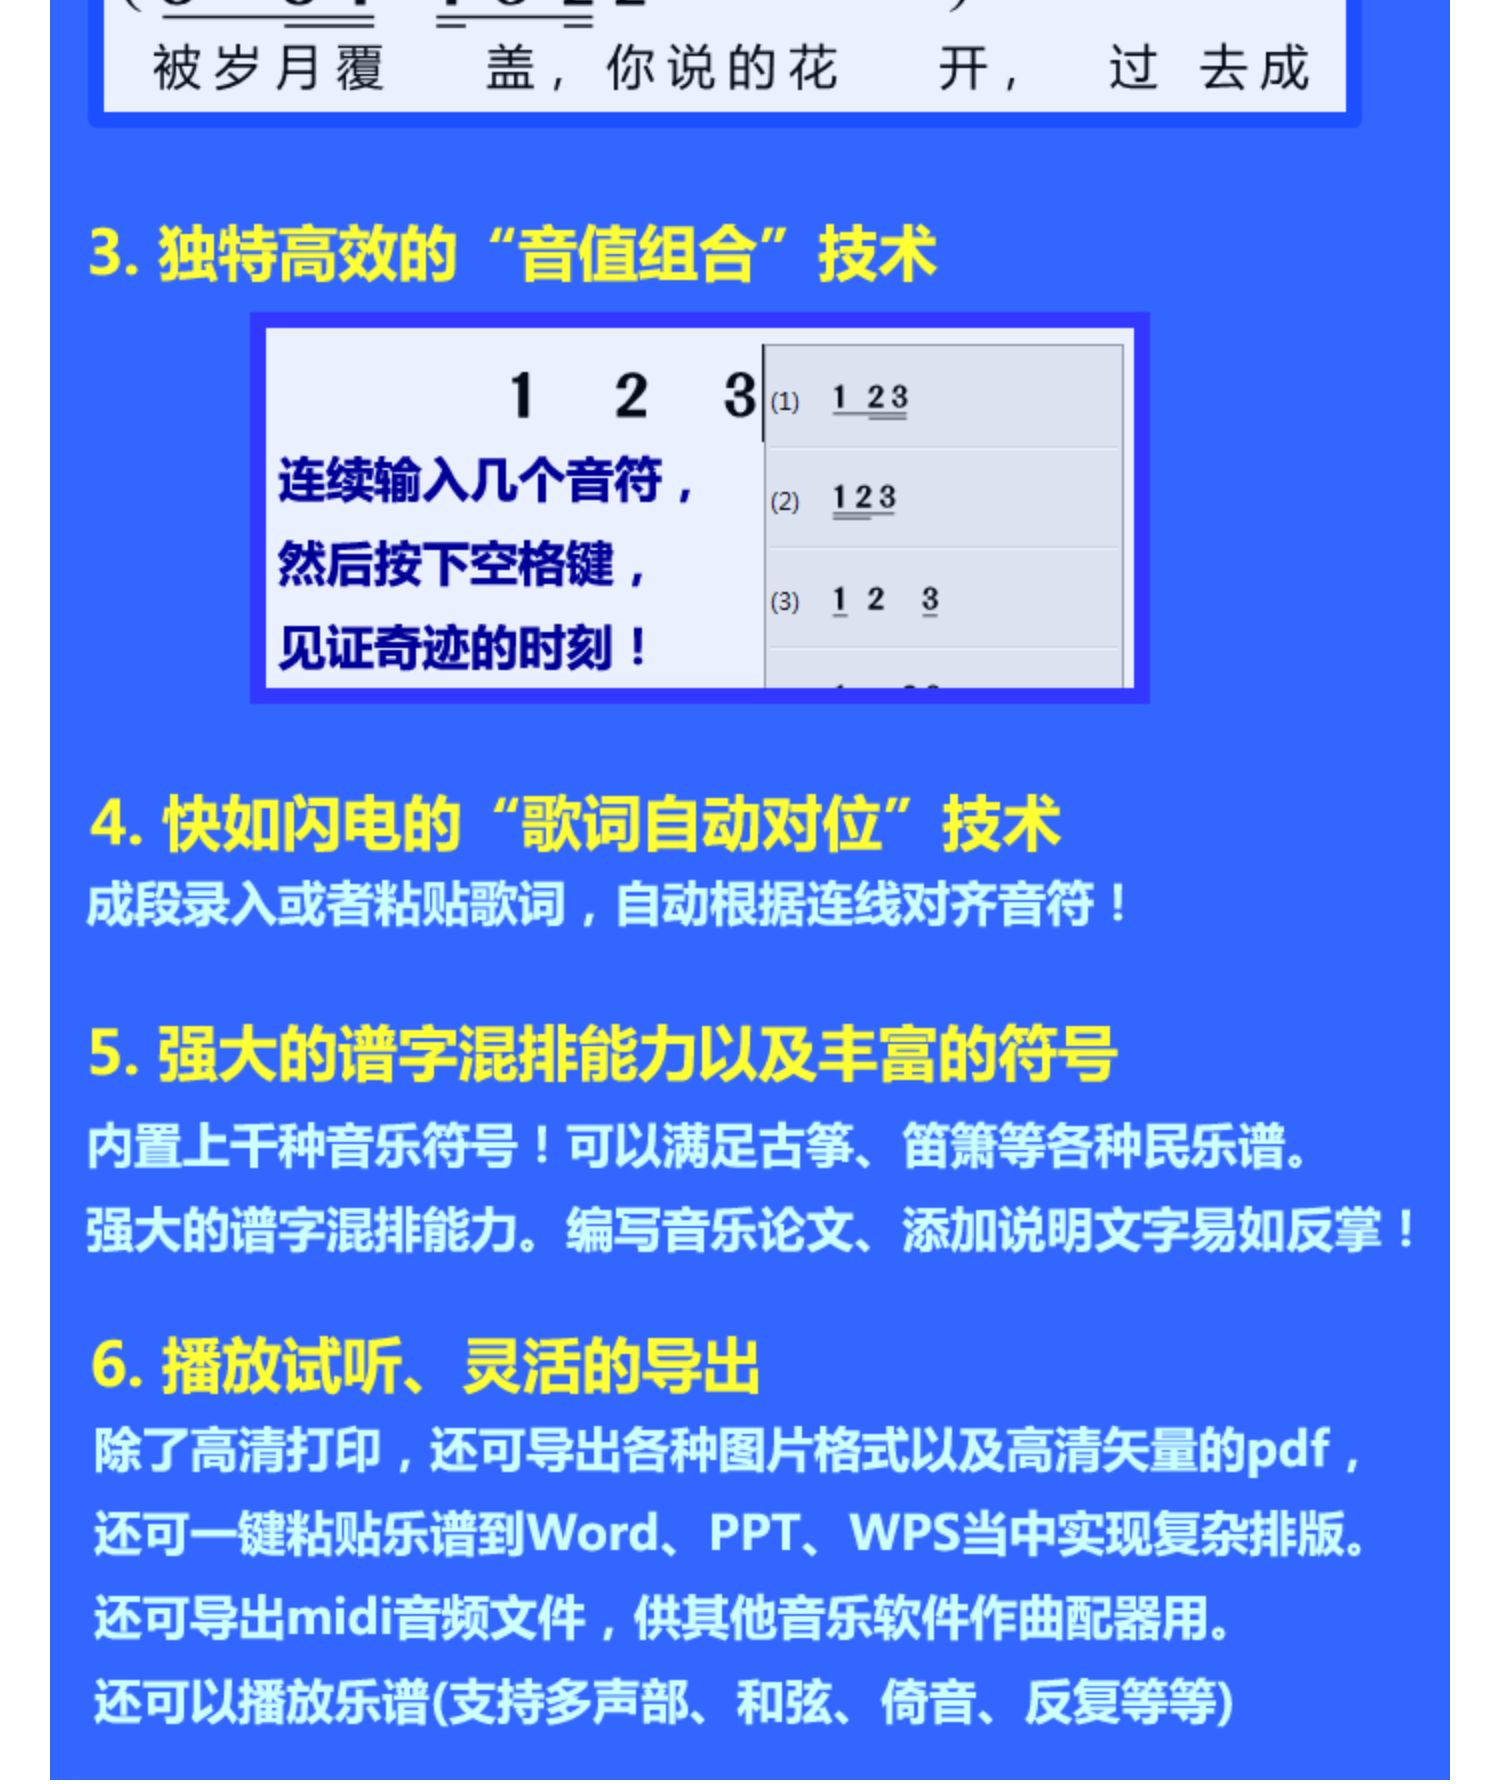 JP-Word簡譜編輯軟體(制譜軟體 JPW JPWord)-加密狗版 官方正版